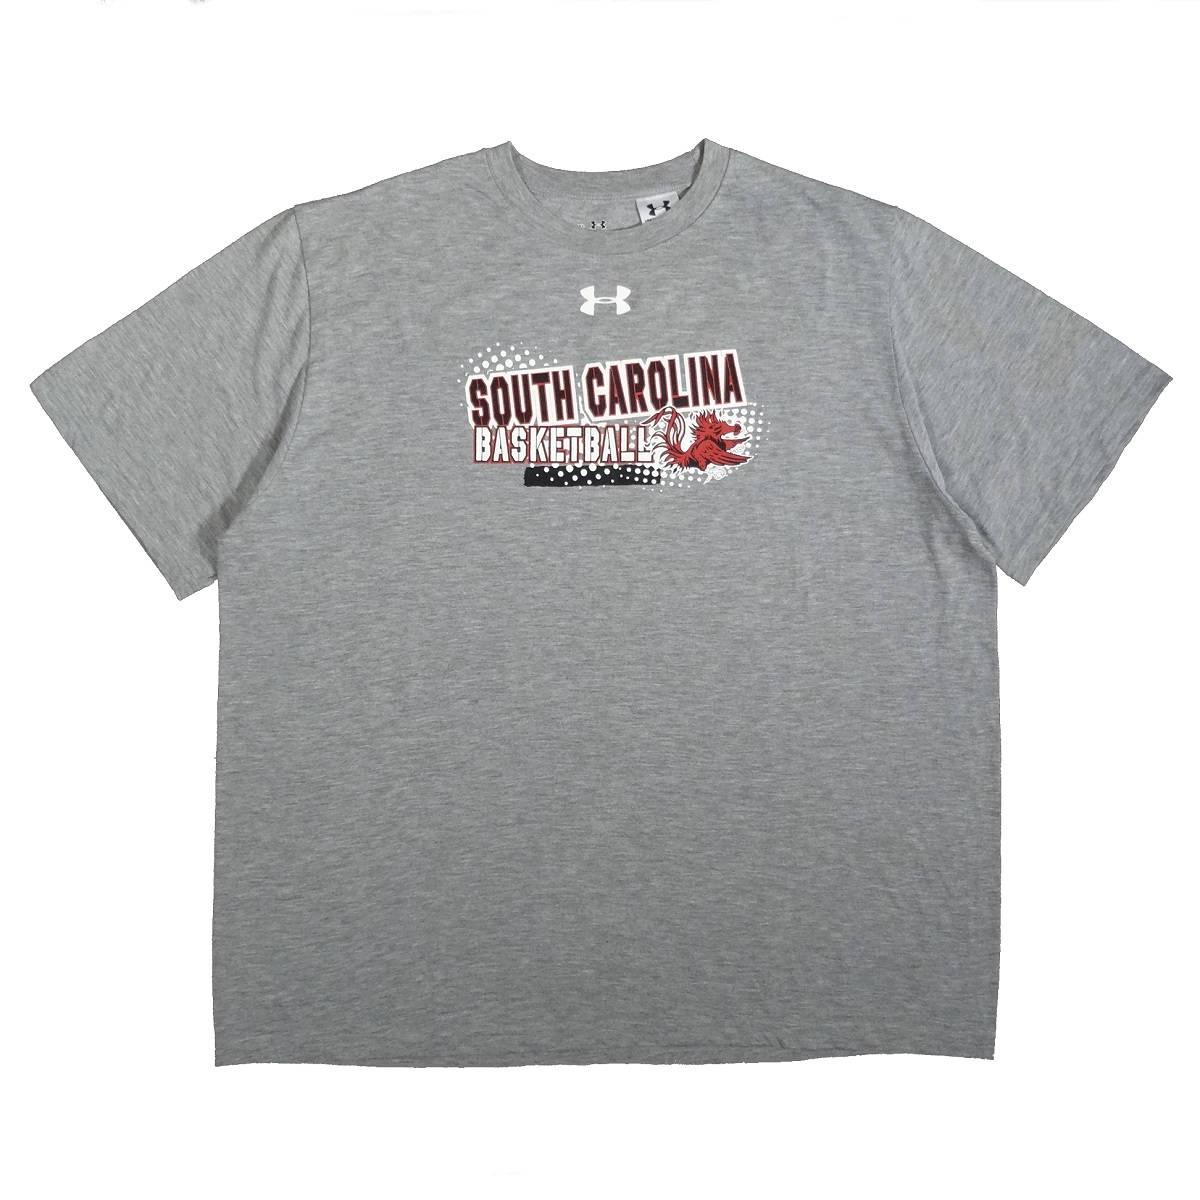 South Carolina Gamecocks Basketball Under Armour Shirt Front